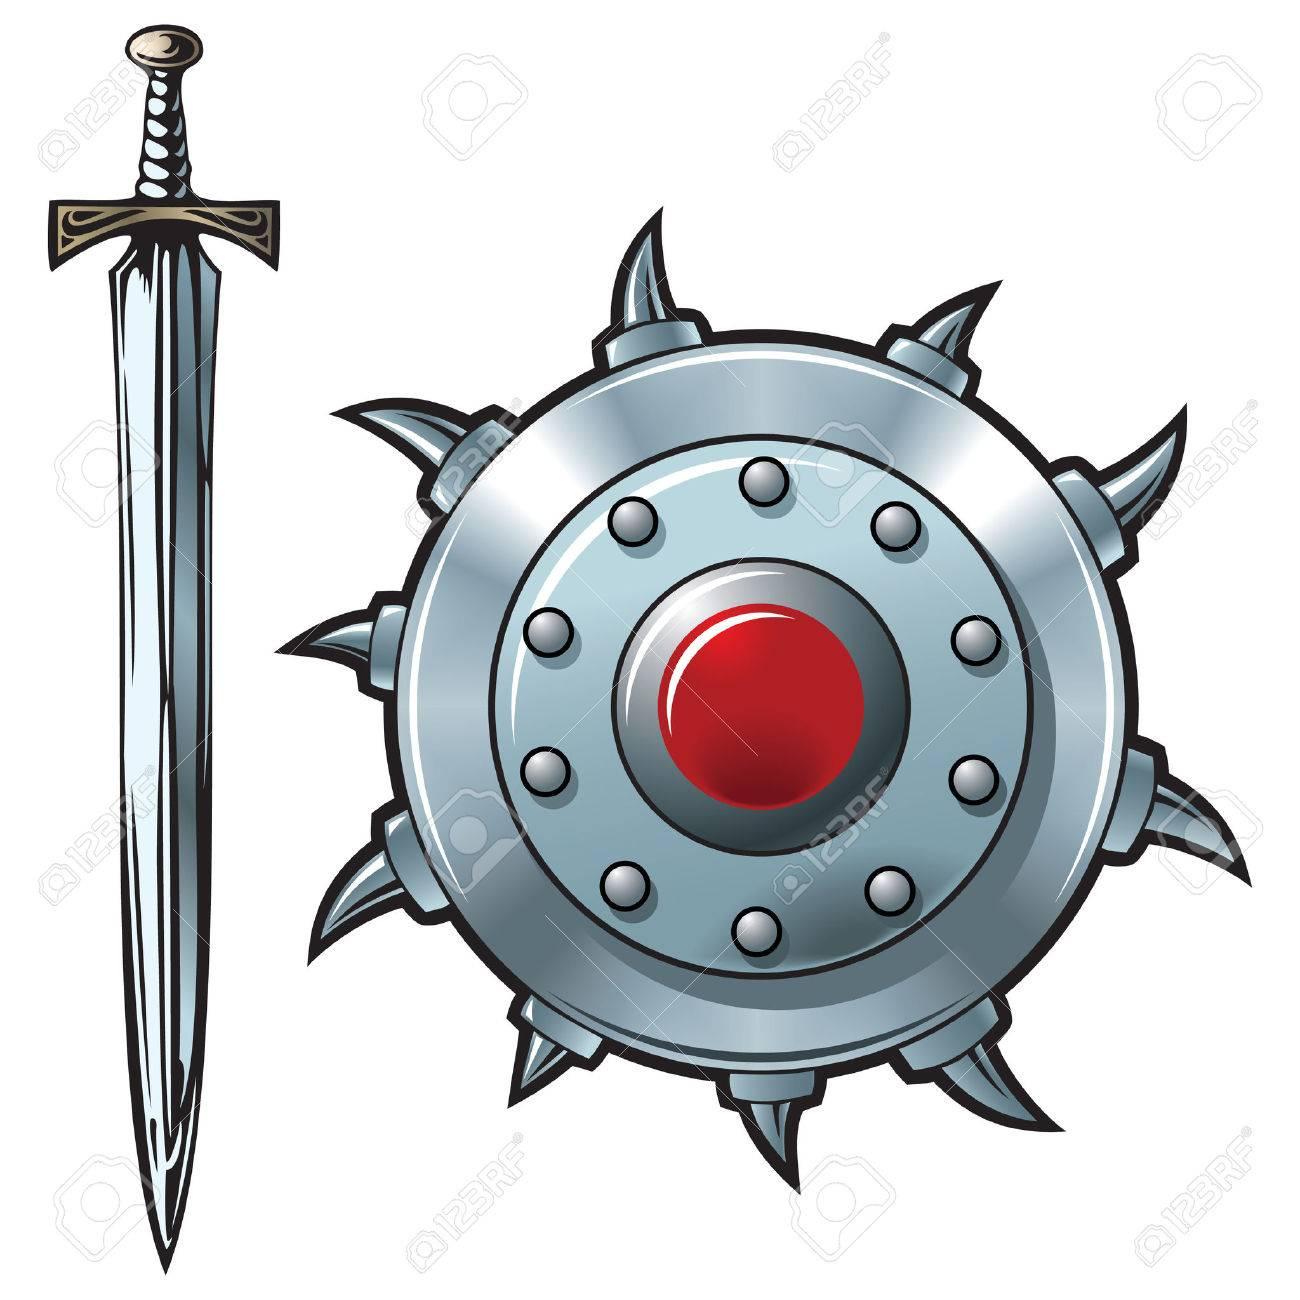 Fantasy sword and shield made of shining metal, vector illustration Stock Vector - 5921085